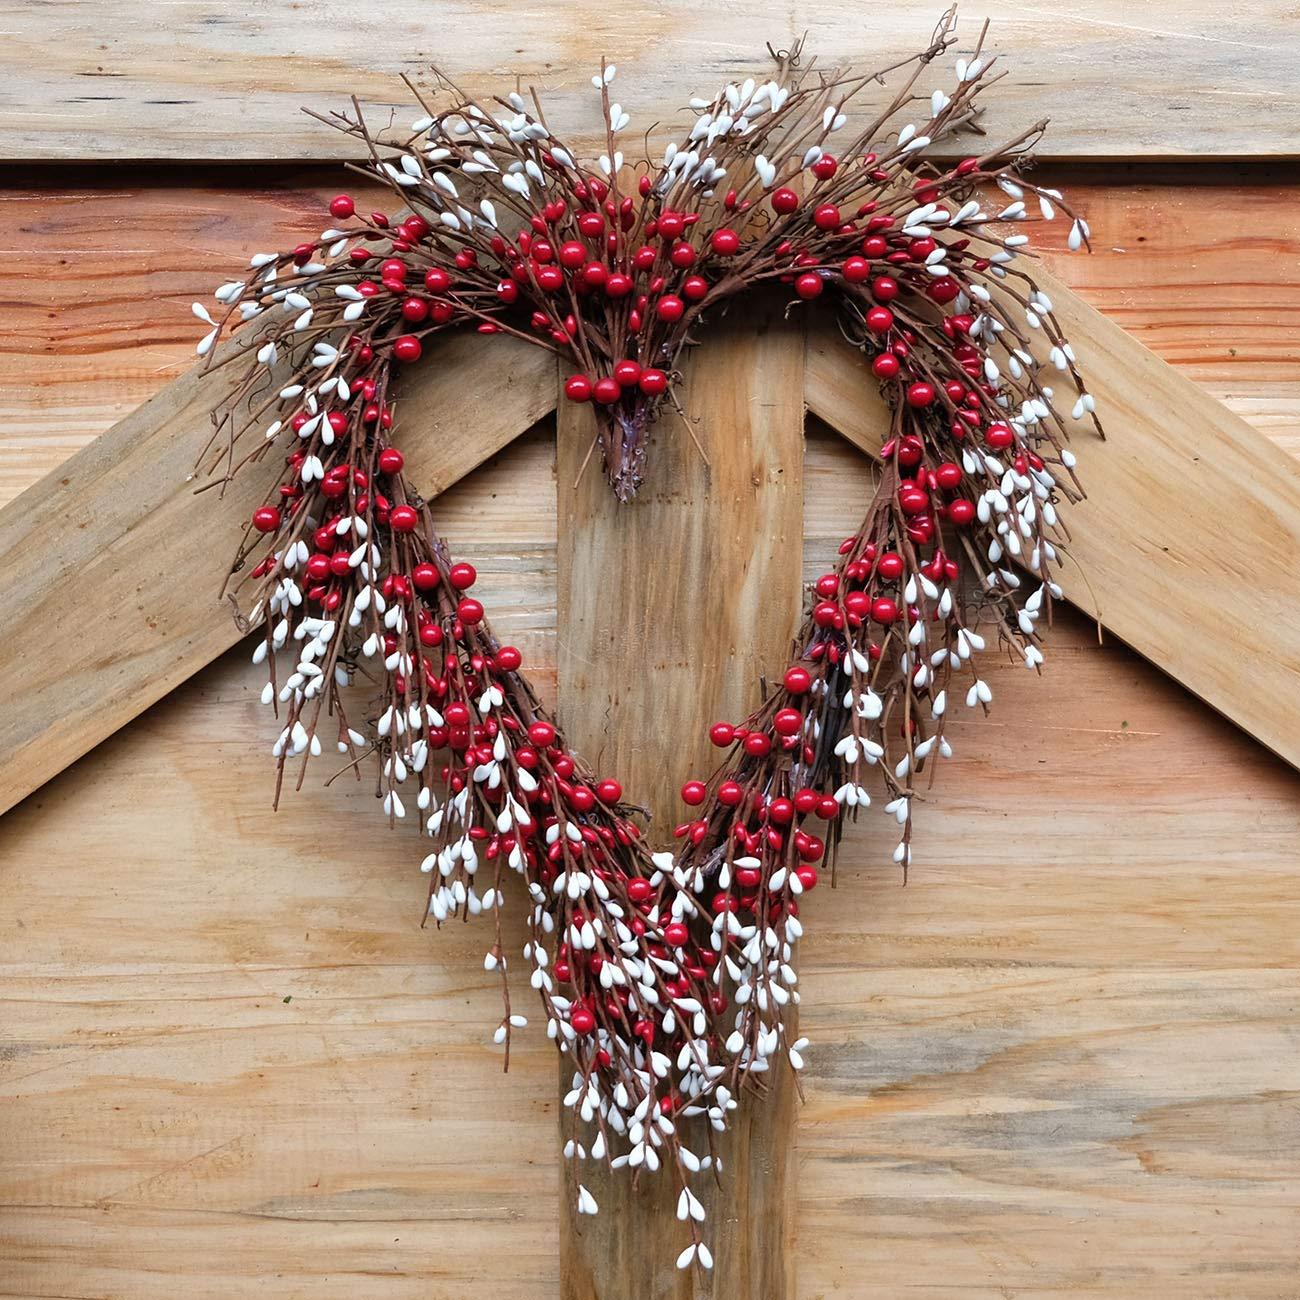 idyllic Heart Wreath Handmade Red Berry Heart Shaped Wreath Rustic Twig for Door Decorative Classic Indoor Decor 18 Inches Valentines Wreath